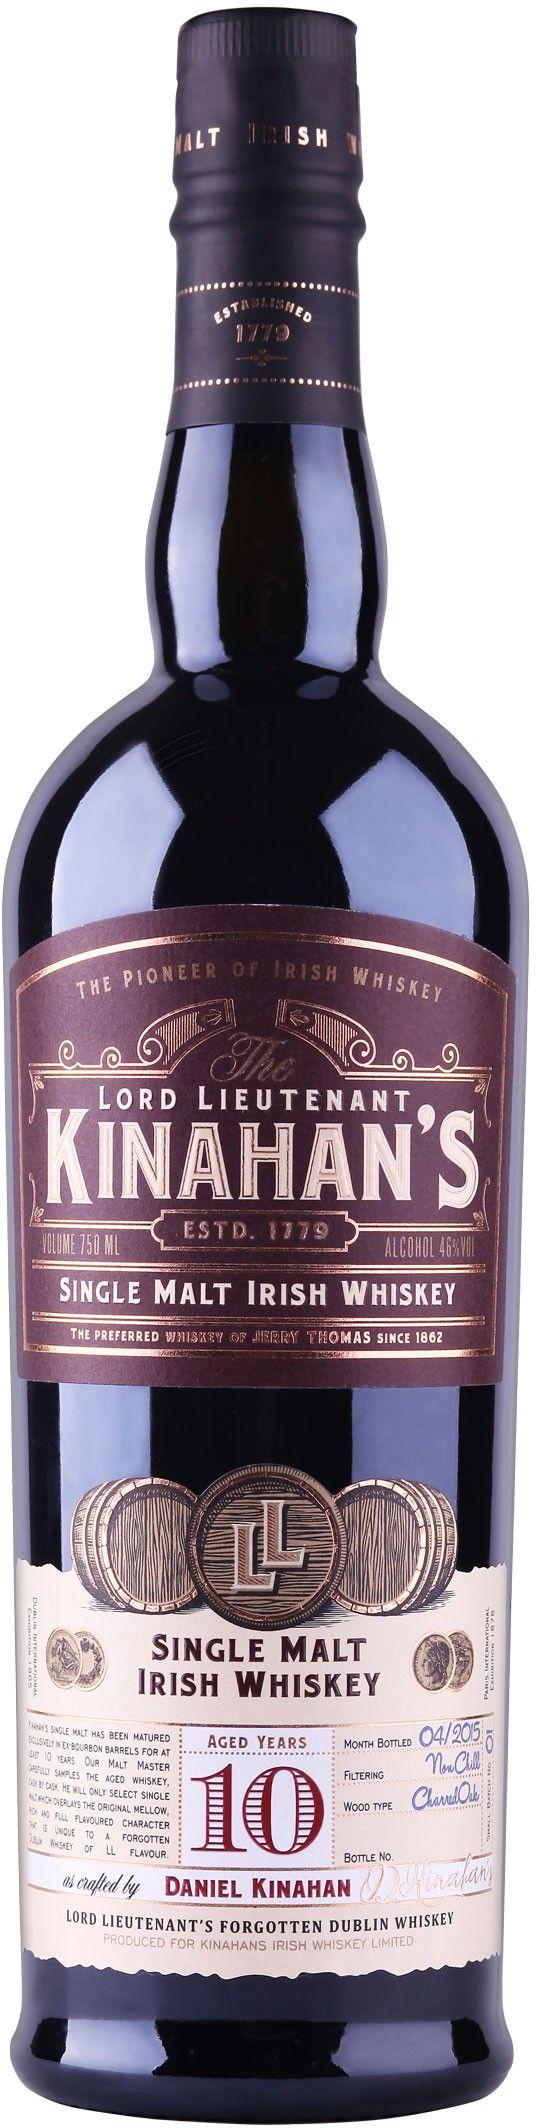 Kinahan's 10 Year Old Single Malt Irish Whiskey   @Caskers